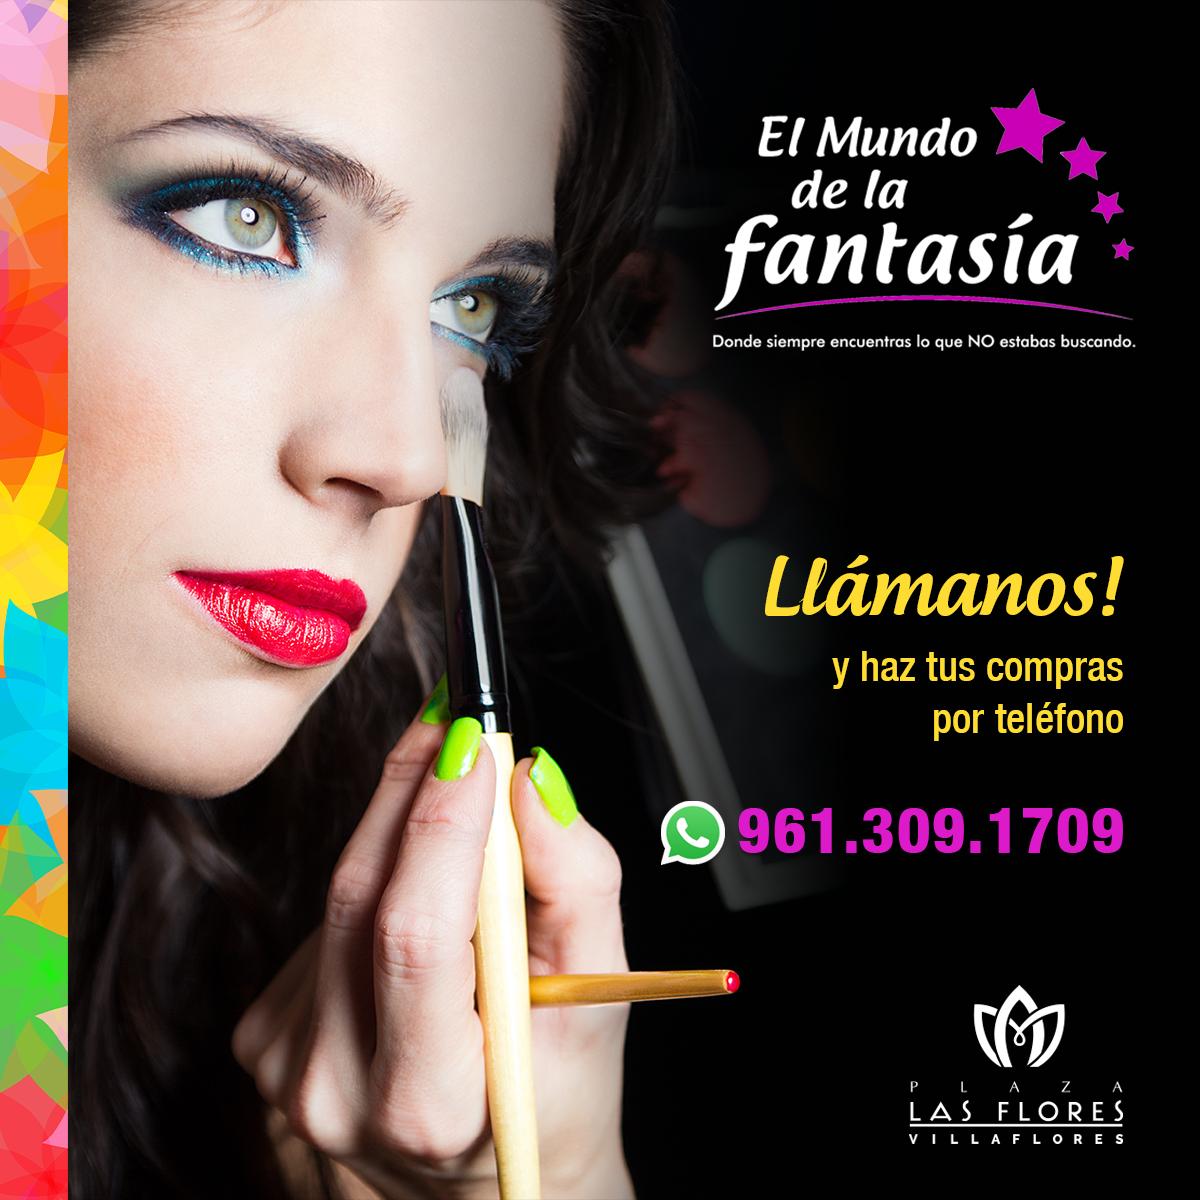 LasFlores-Telefonos-MundoFantasia copy